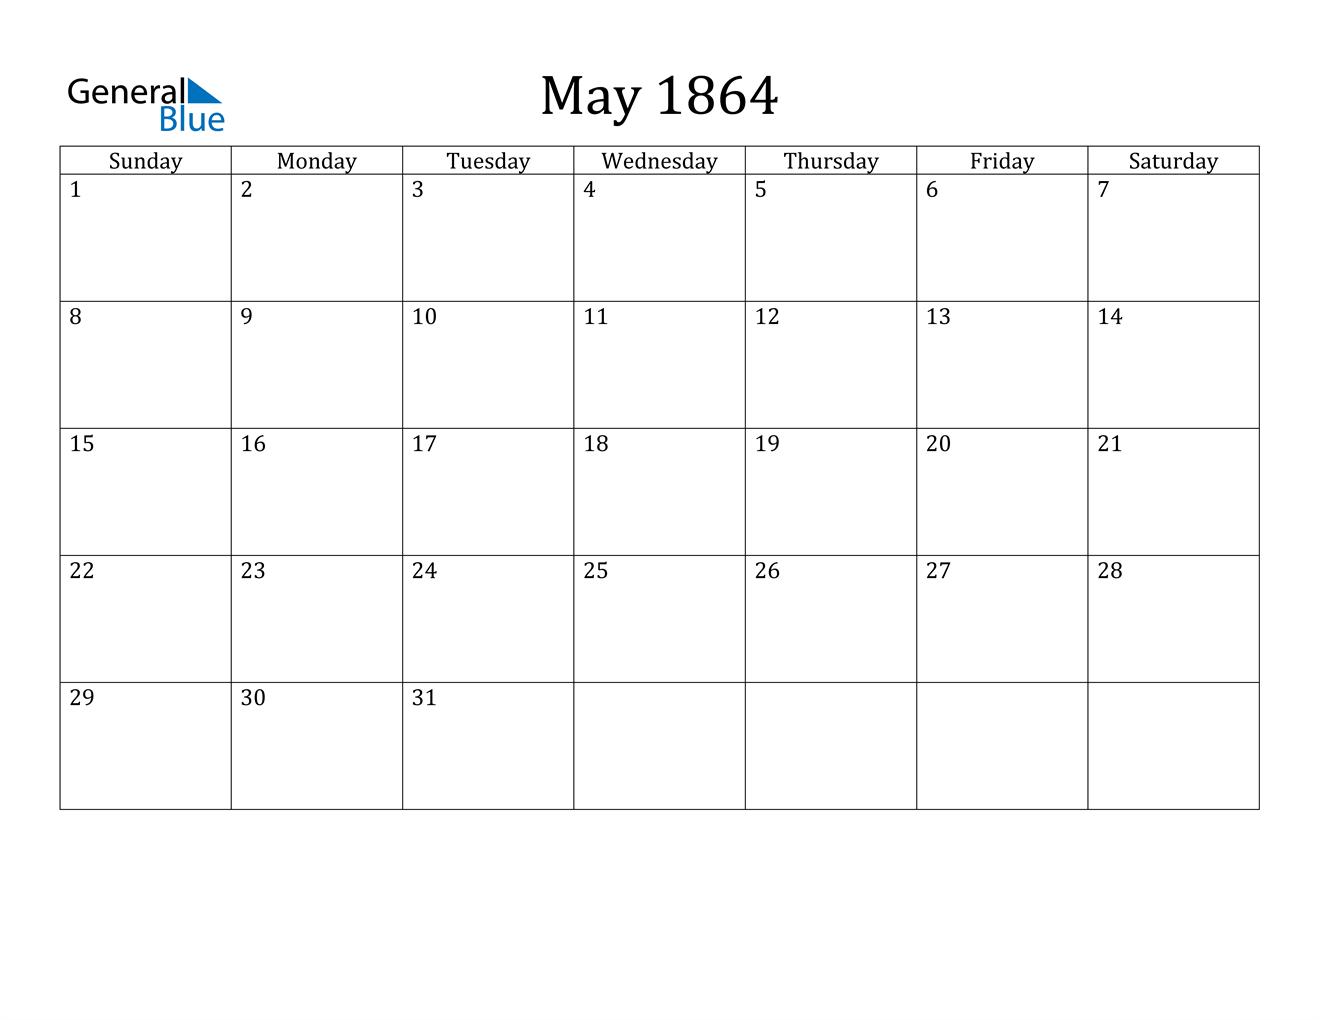 Image of May 1864 Calendar